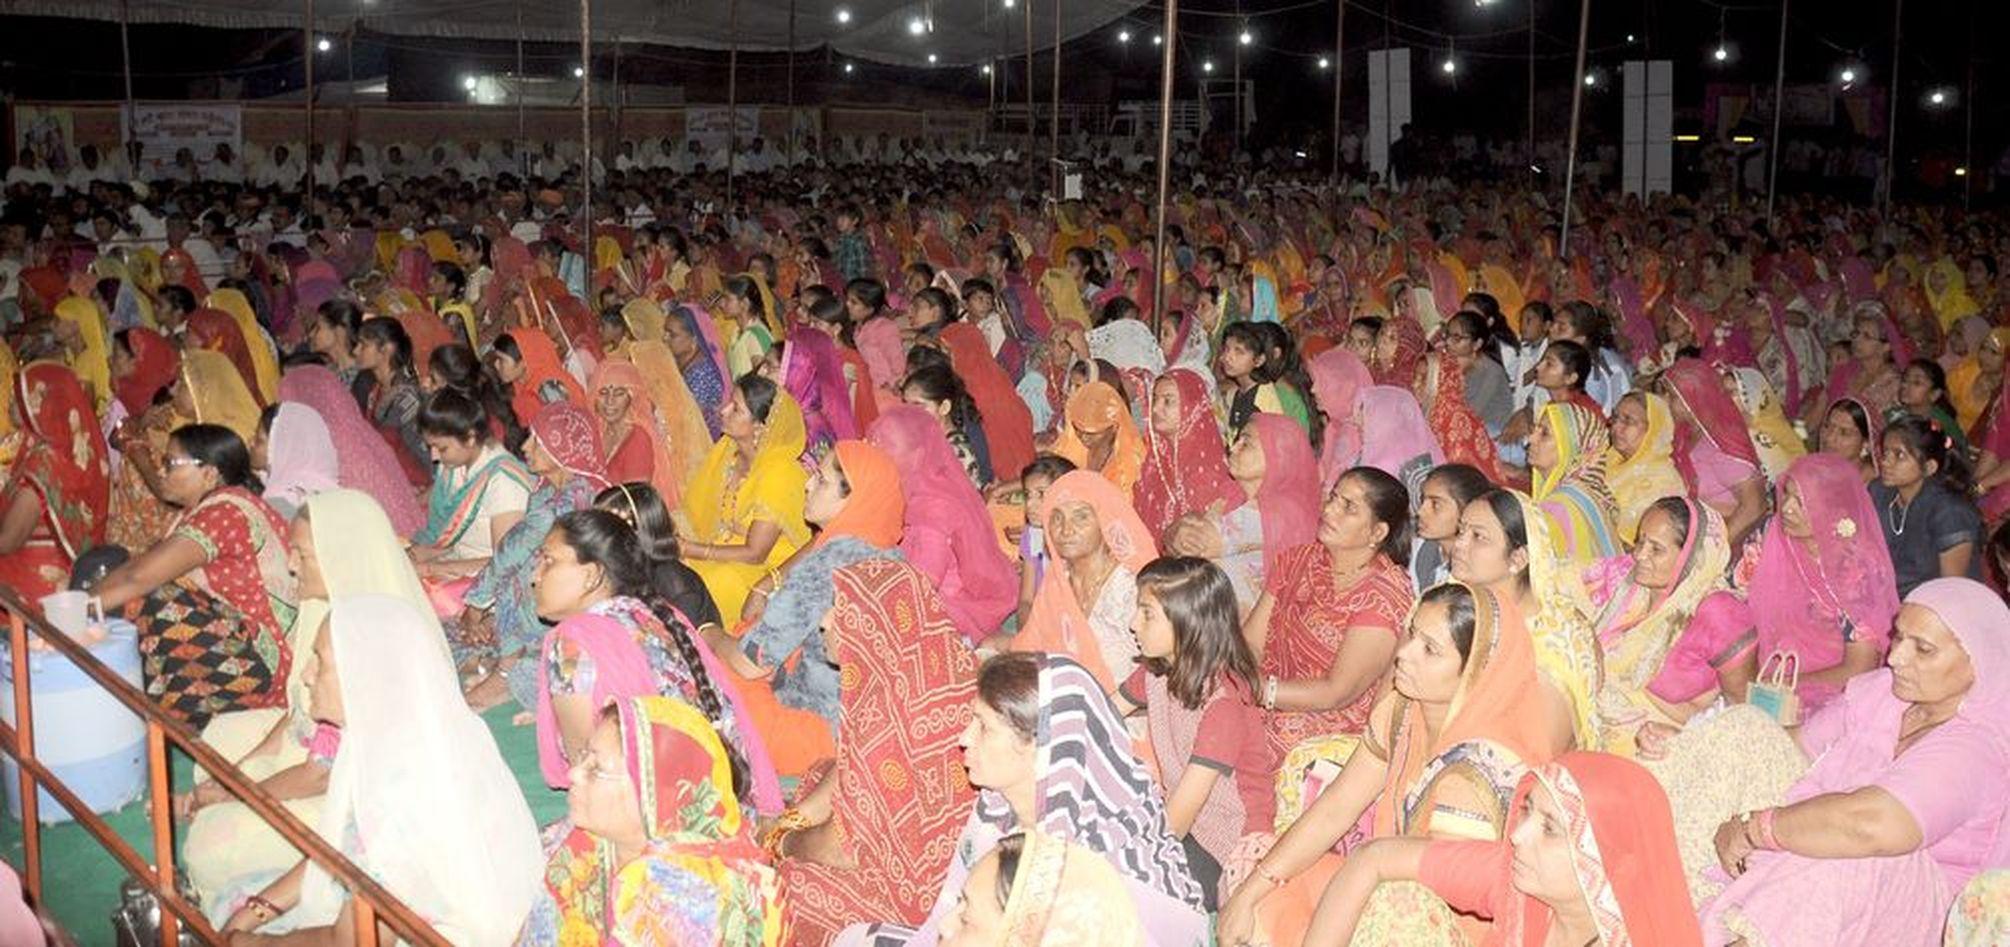 गोकृपा कथा सुनने उमड़ा शहर